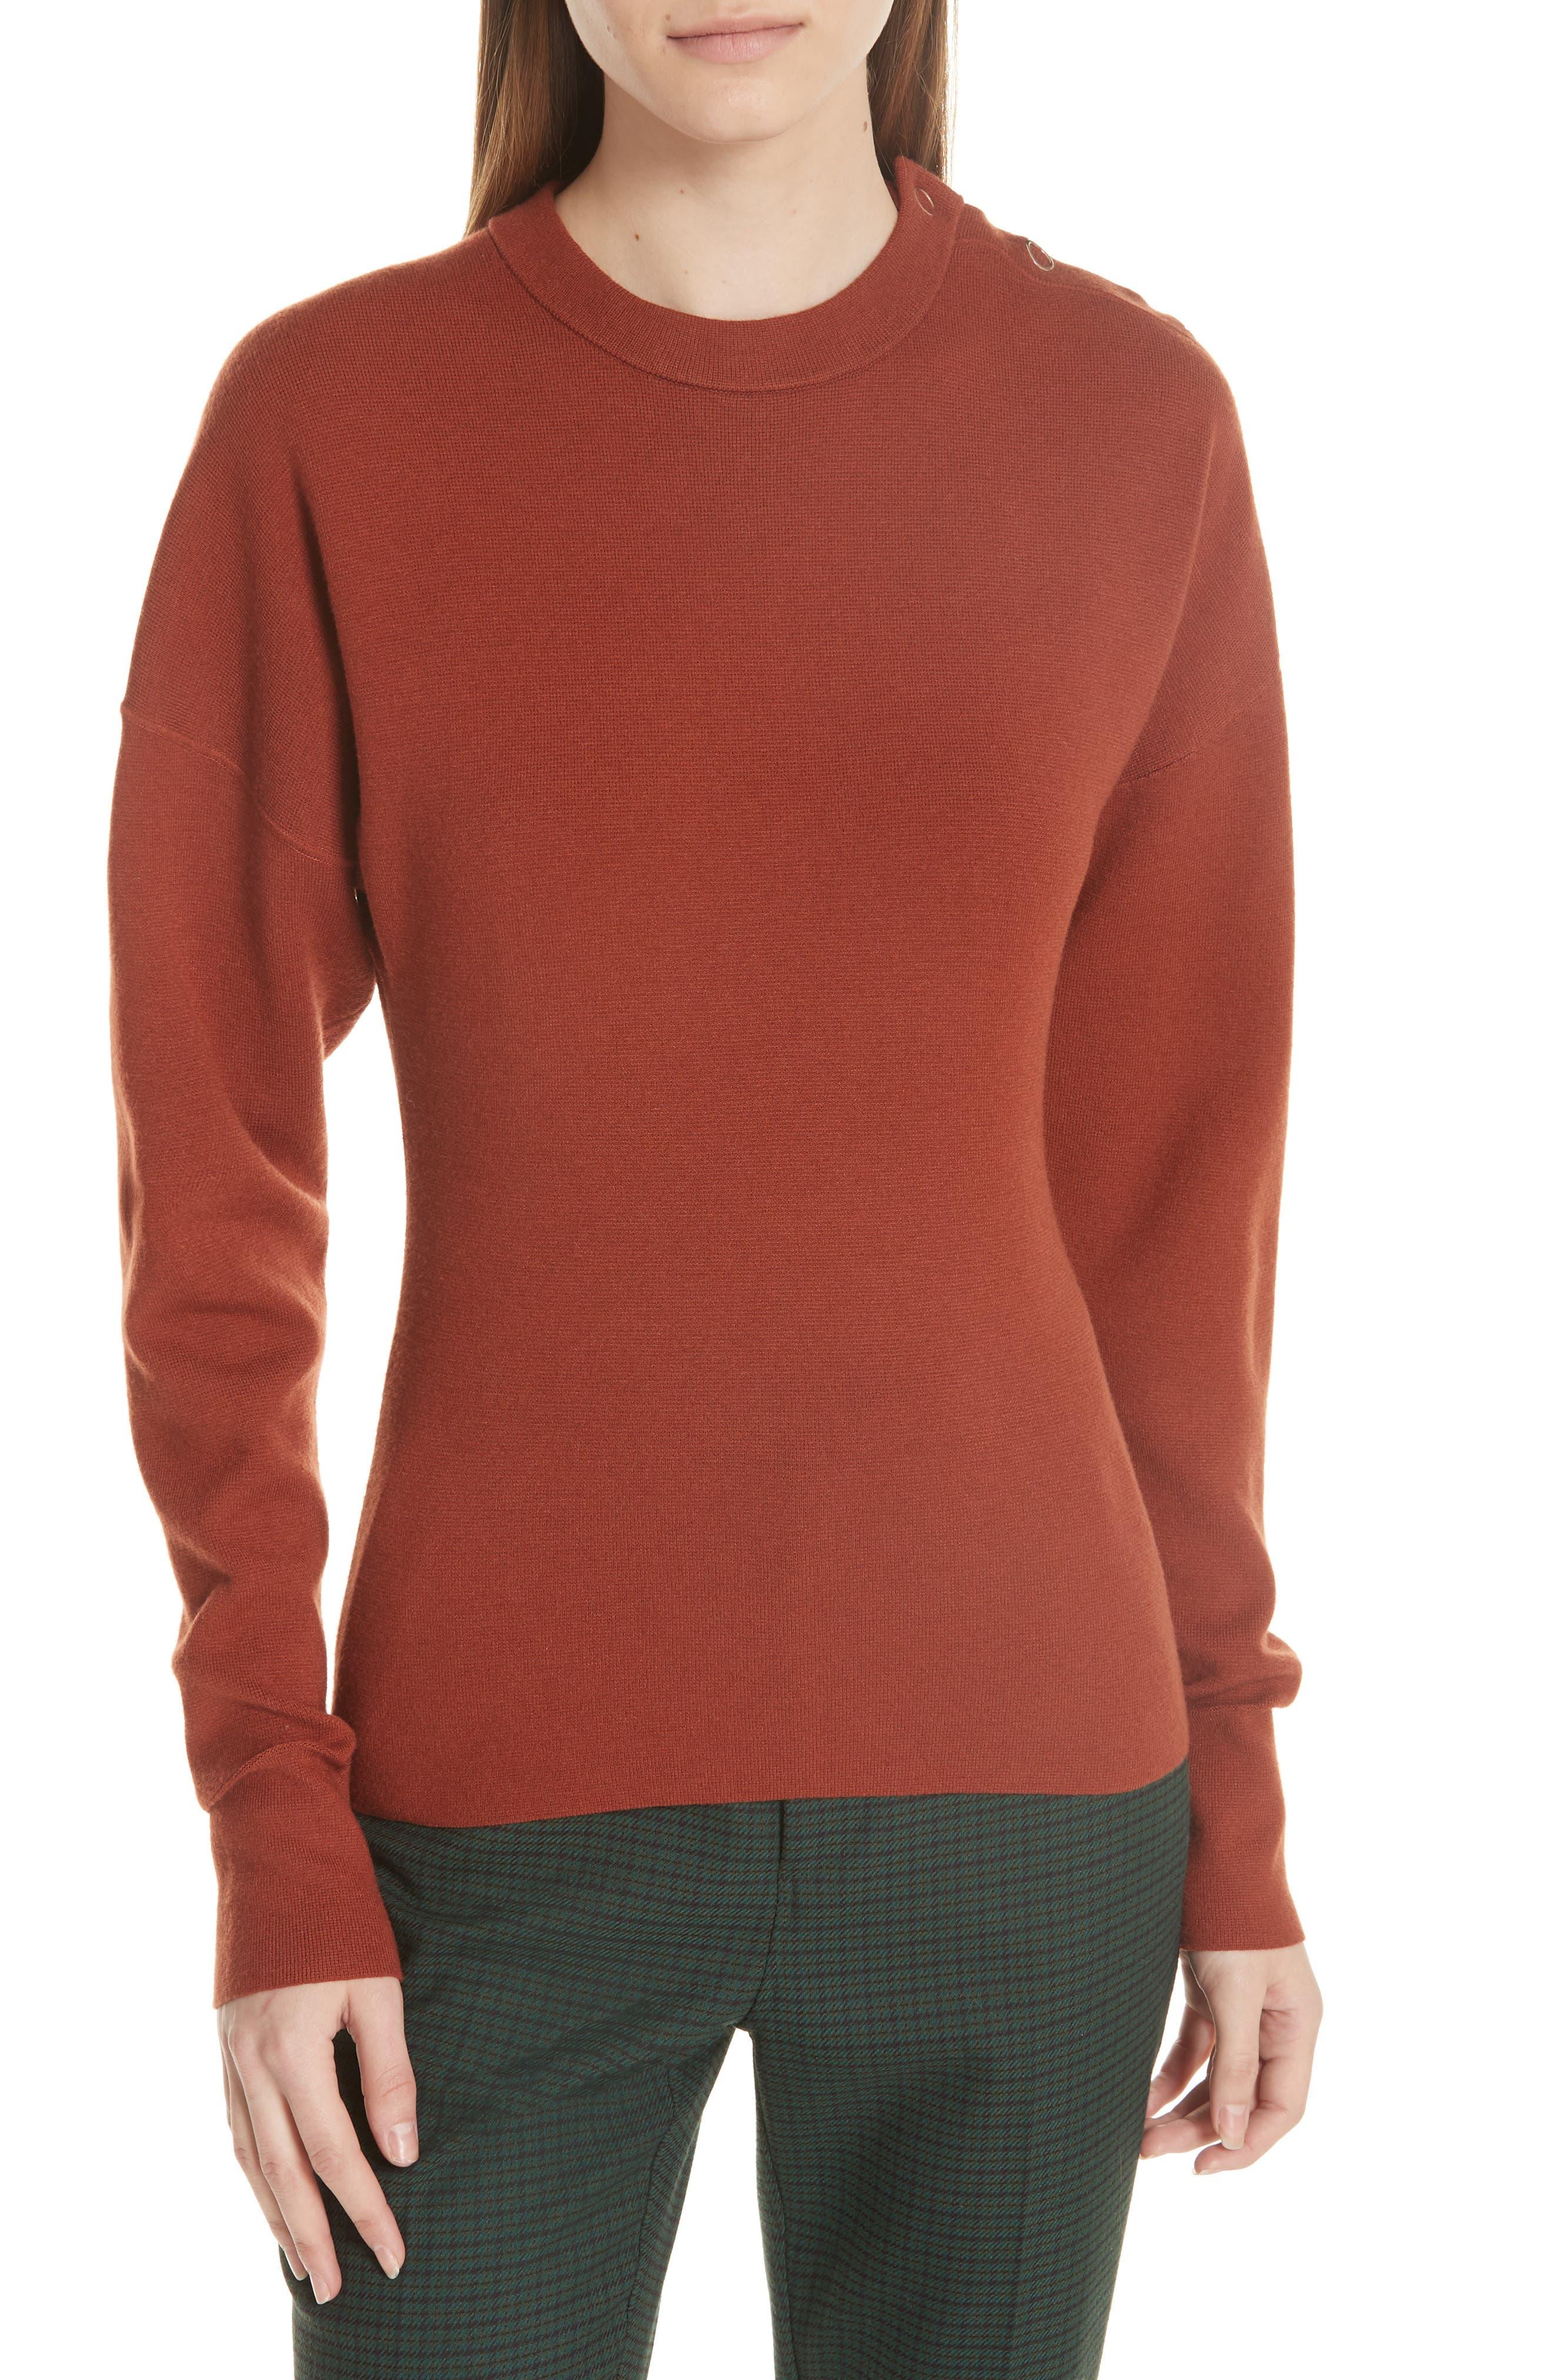 GREY JASON WU Snap Shoulder Sweater in Rust